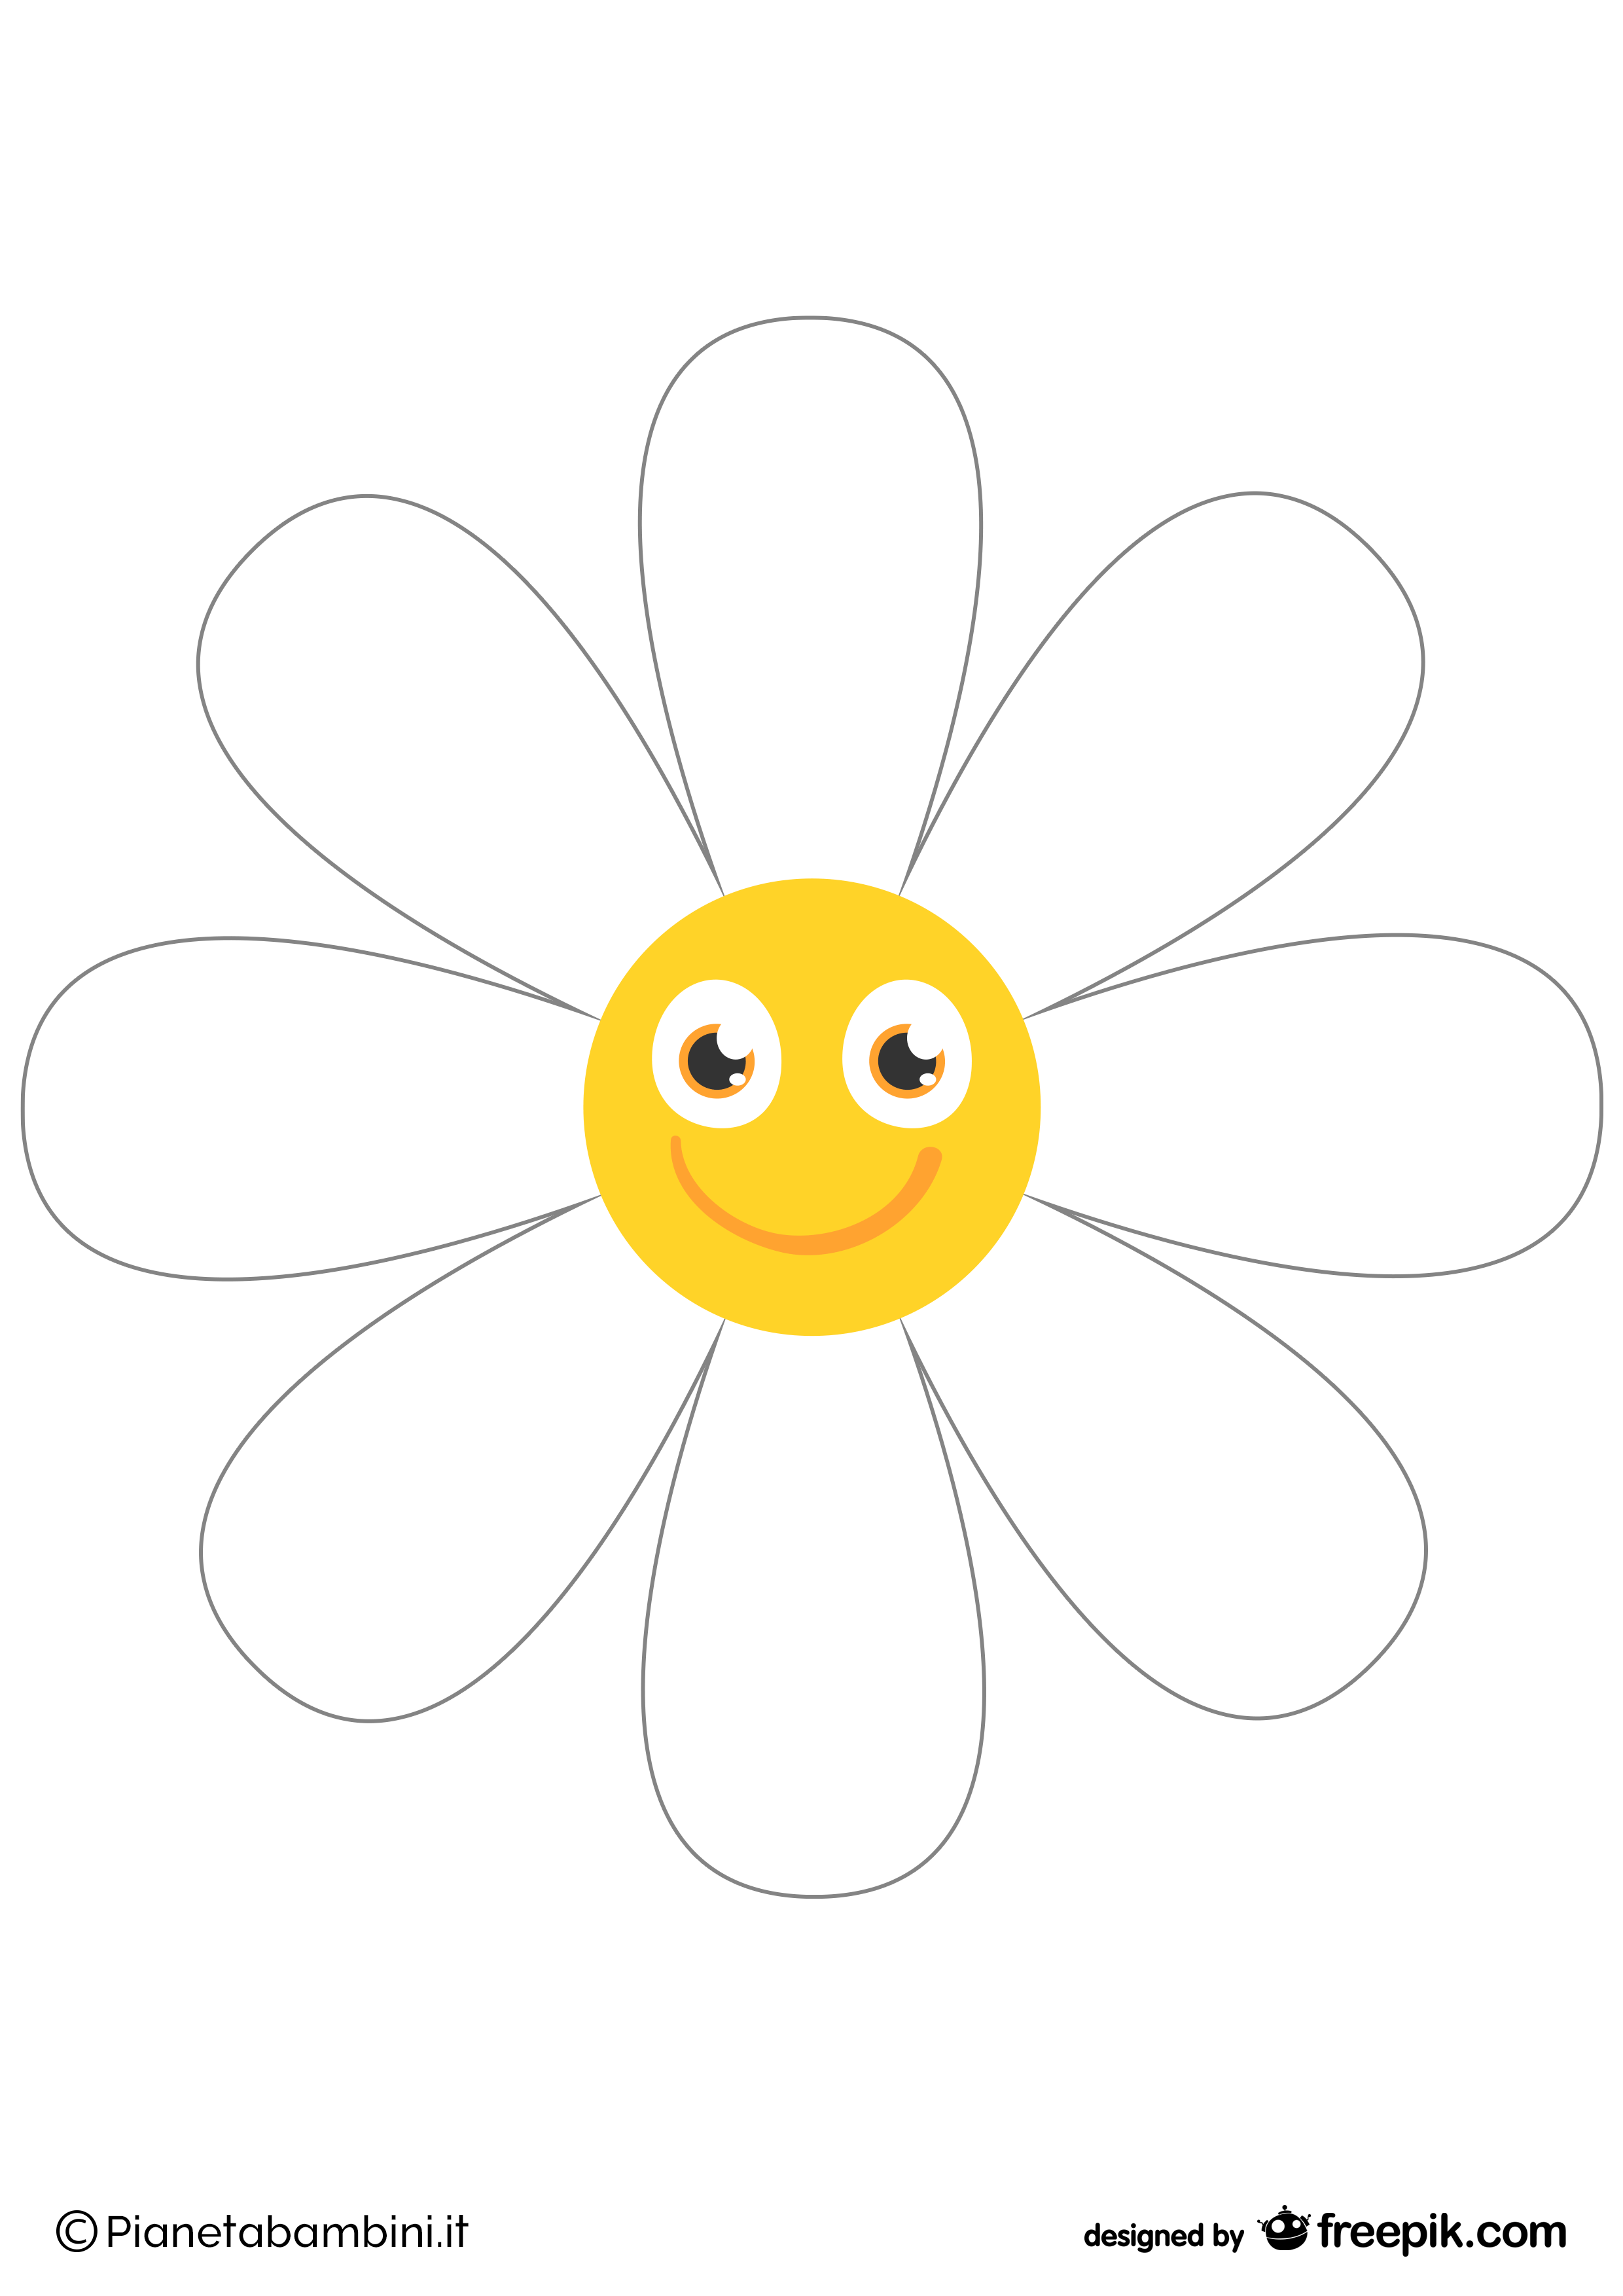 Addobbi di primavera per finestre aule e camerette da stampare - Disegni di natale per finestre ...